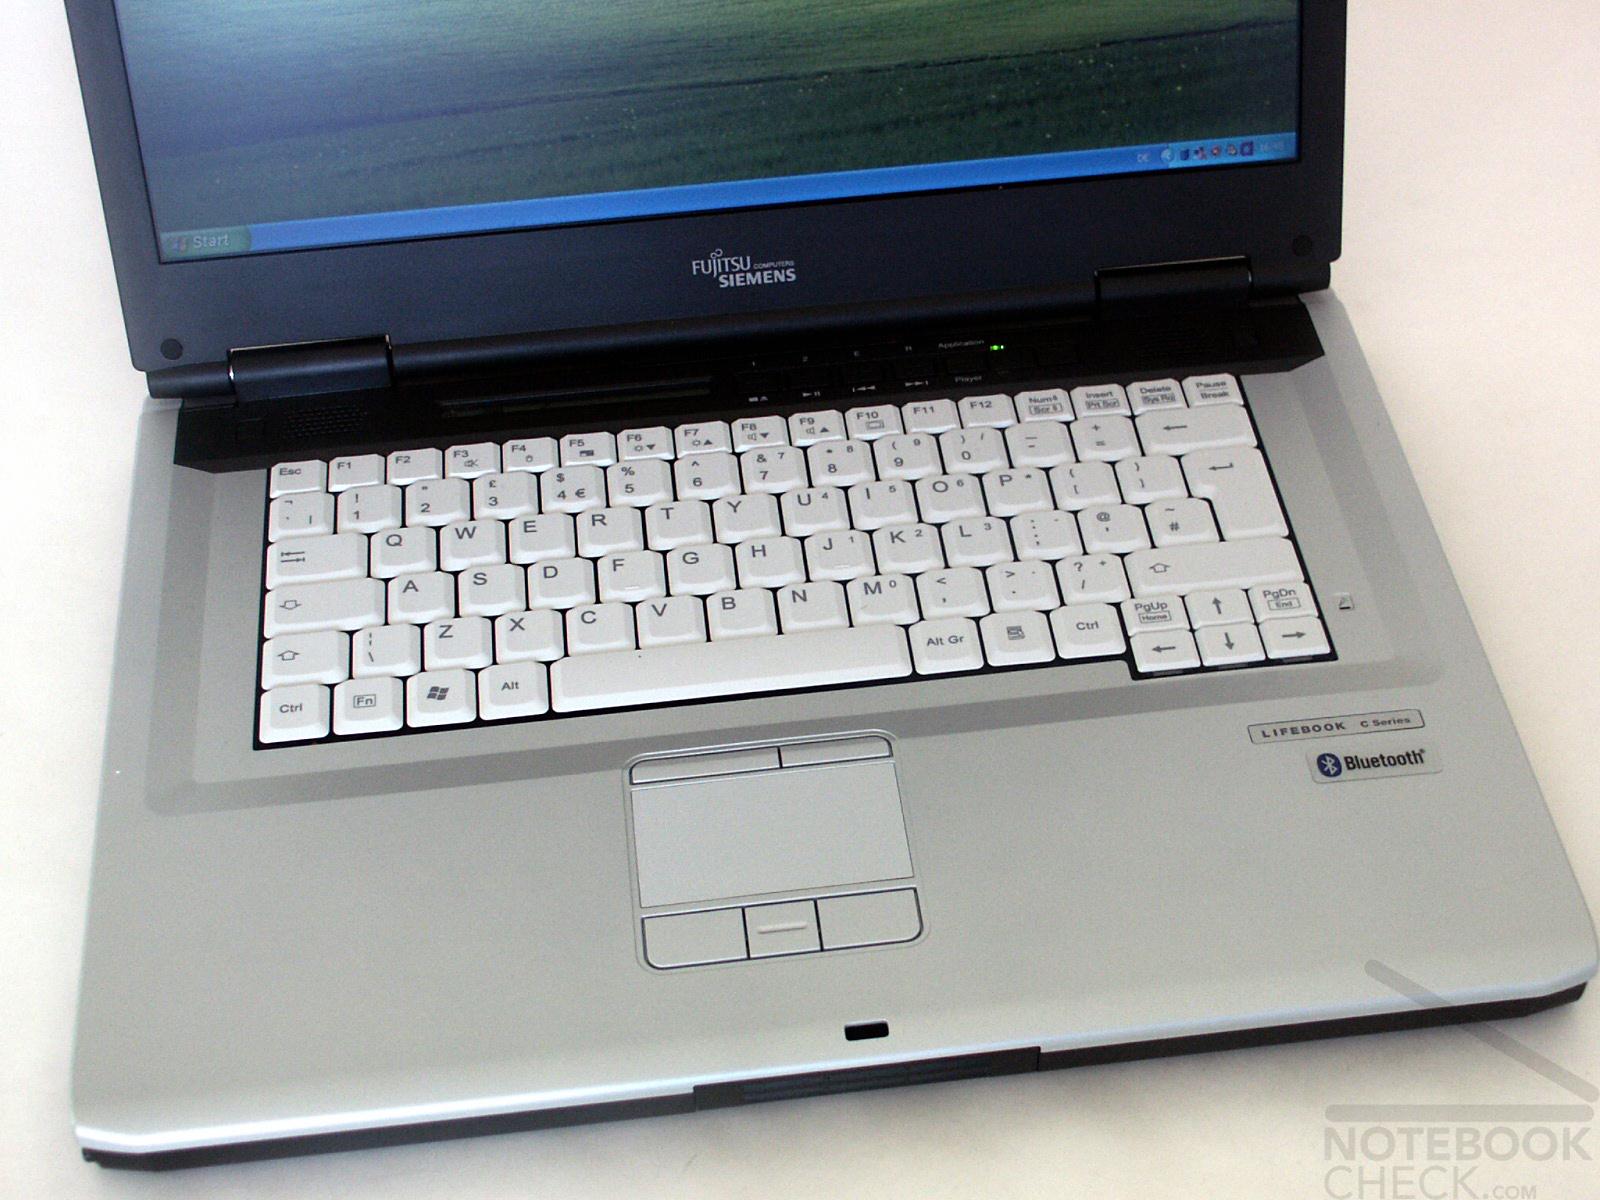 Fujitsu Lifebook C1410 Download Stats